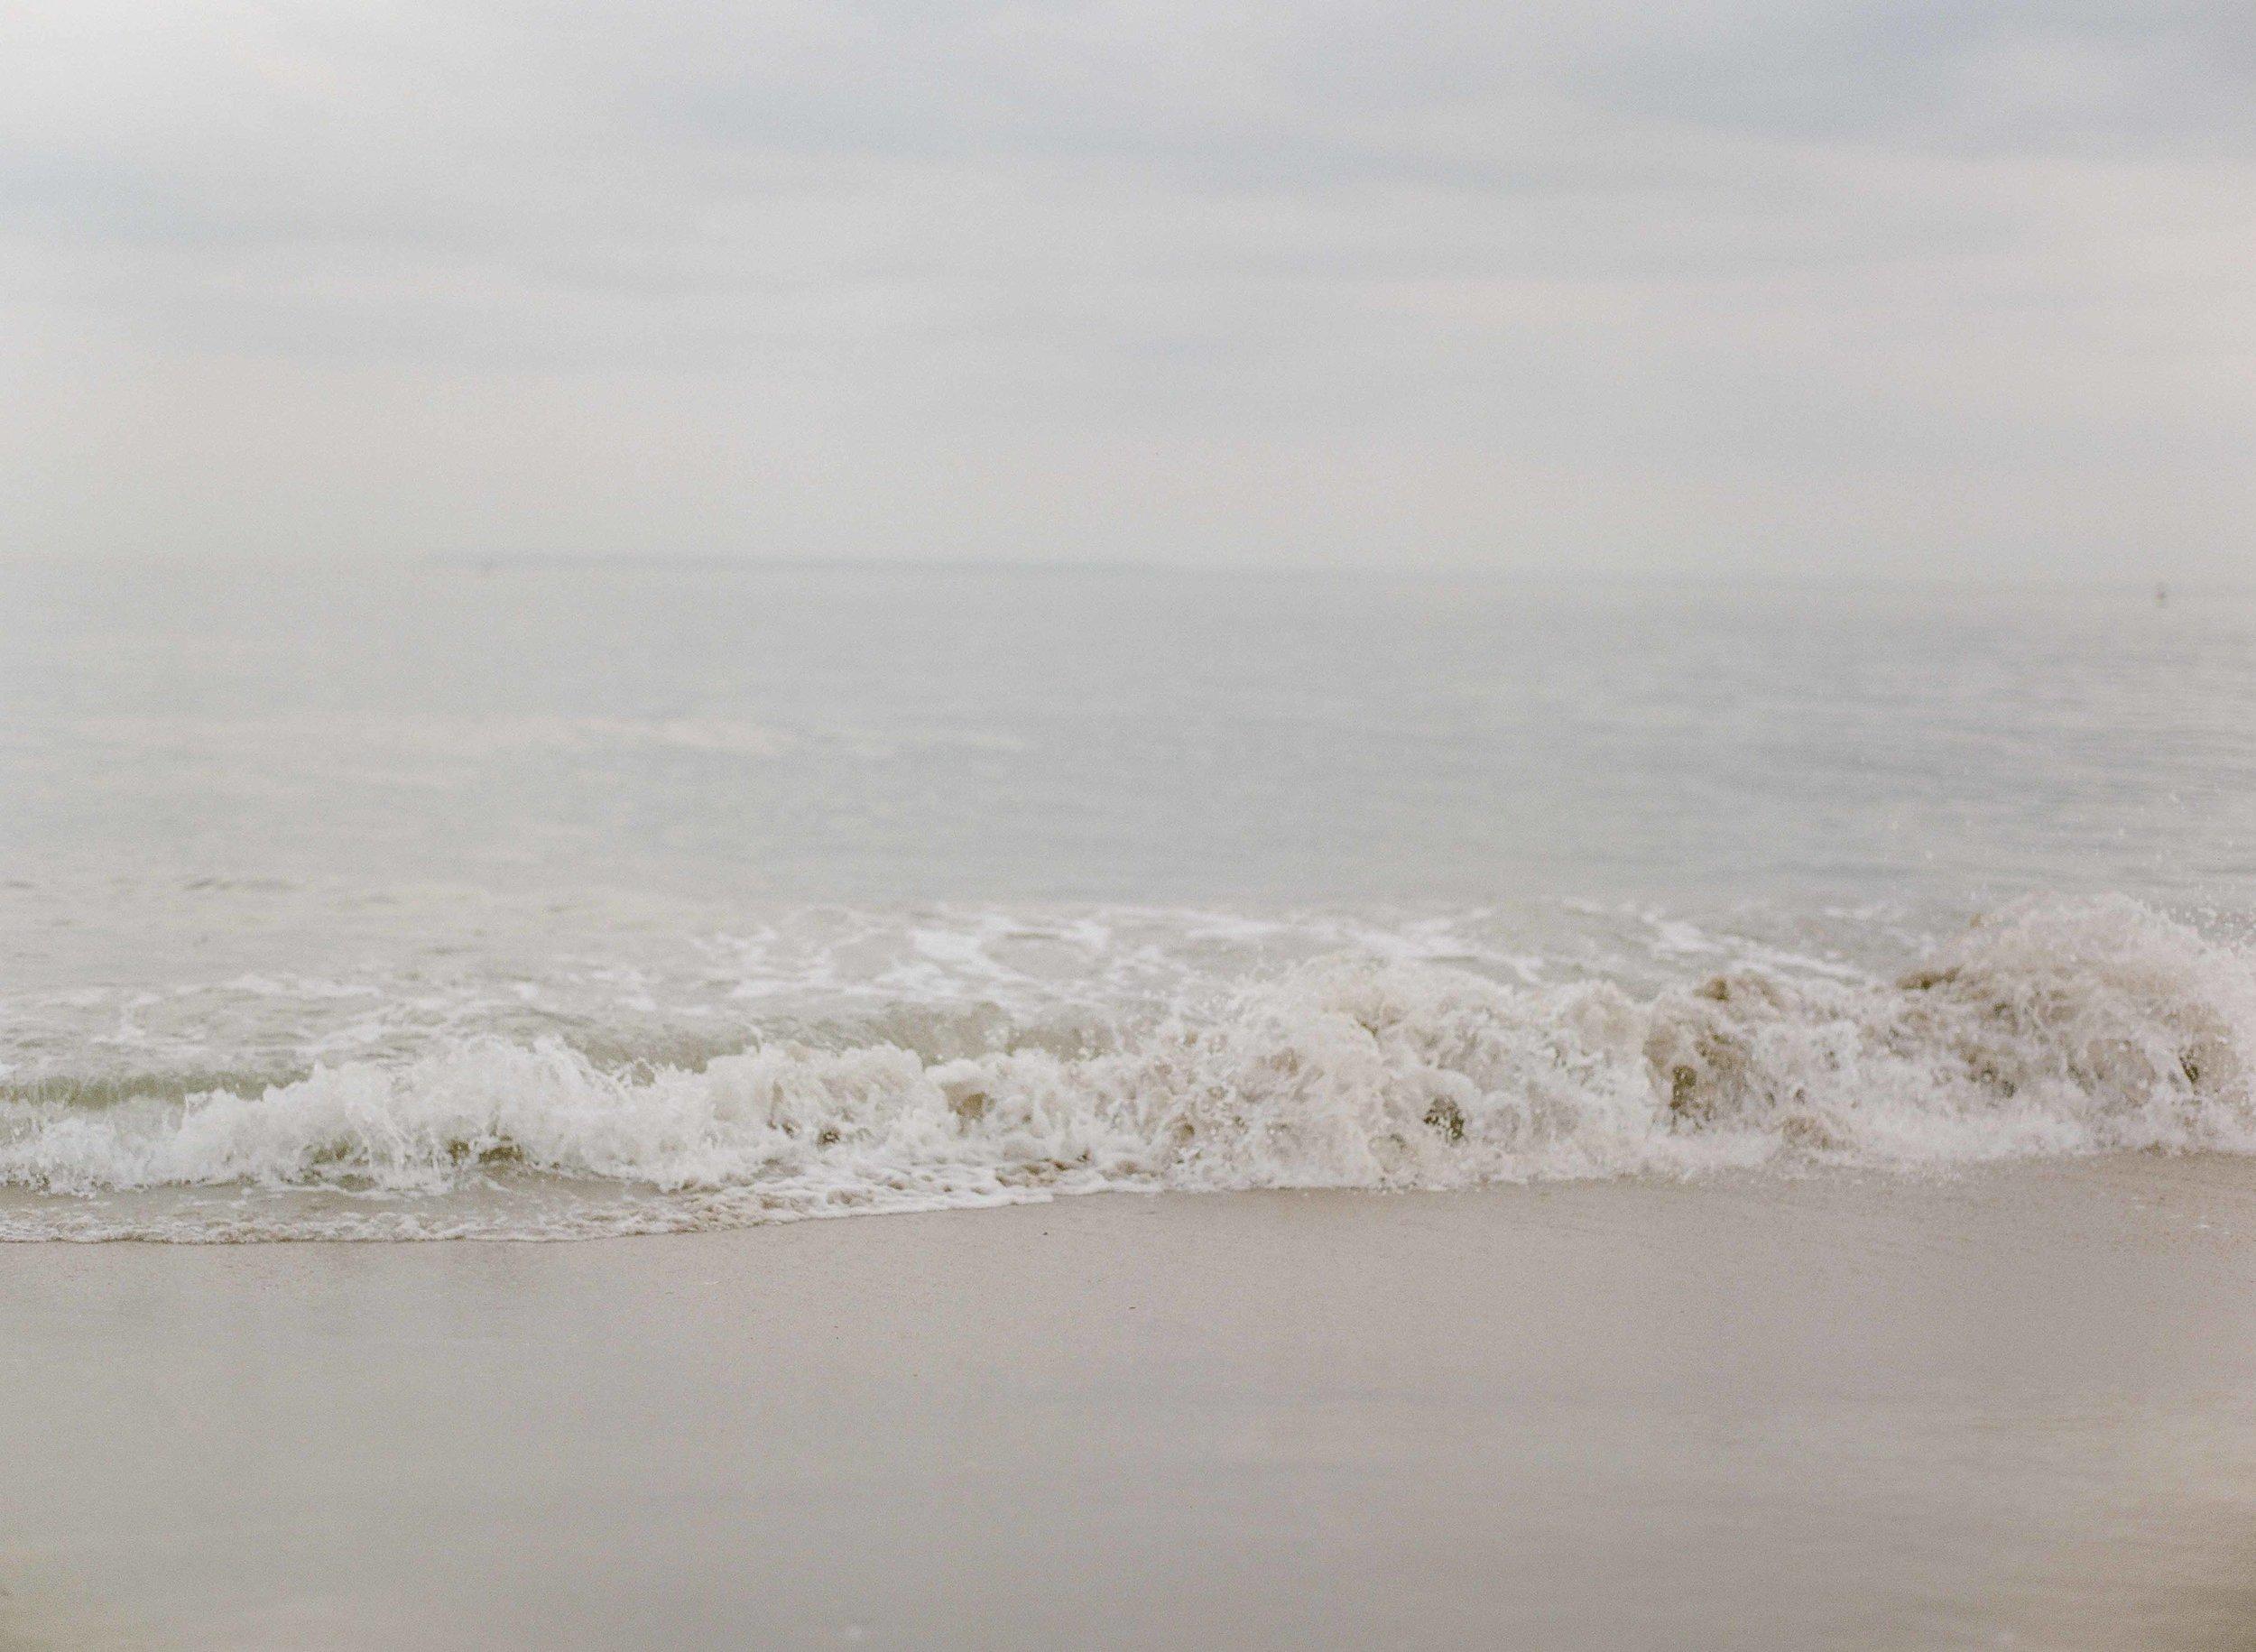 19_coney-island-beach-azael-martinez.jpg